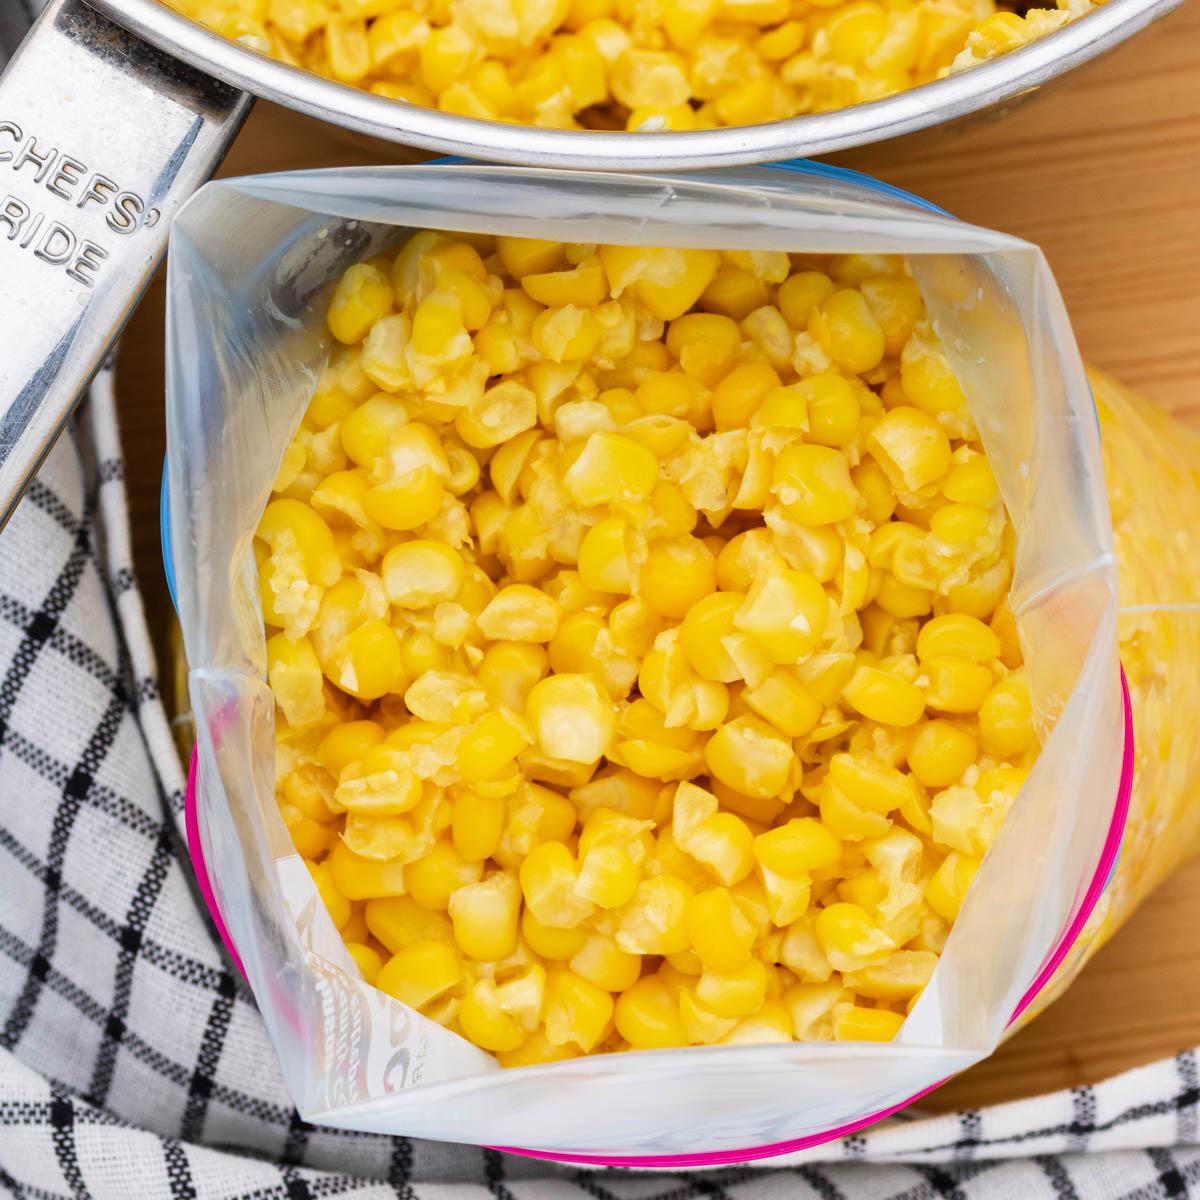 A freezer bag full of bright yellow corn kernels beside a saucepan of corn.